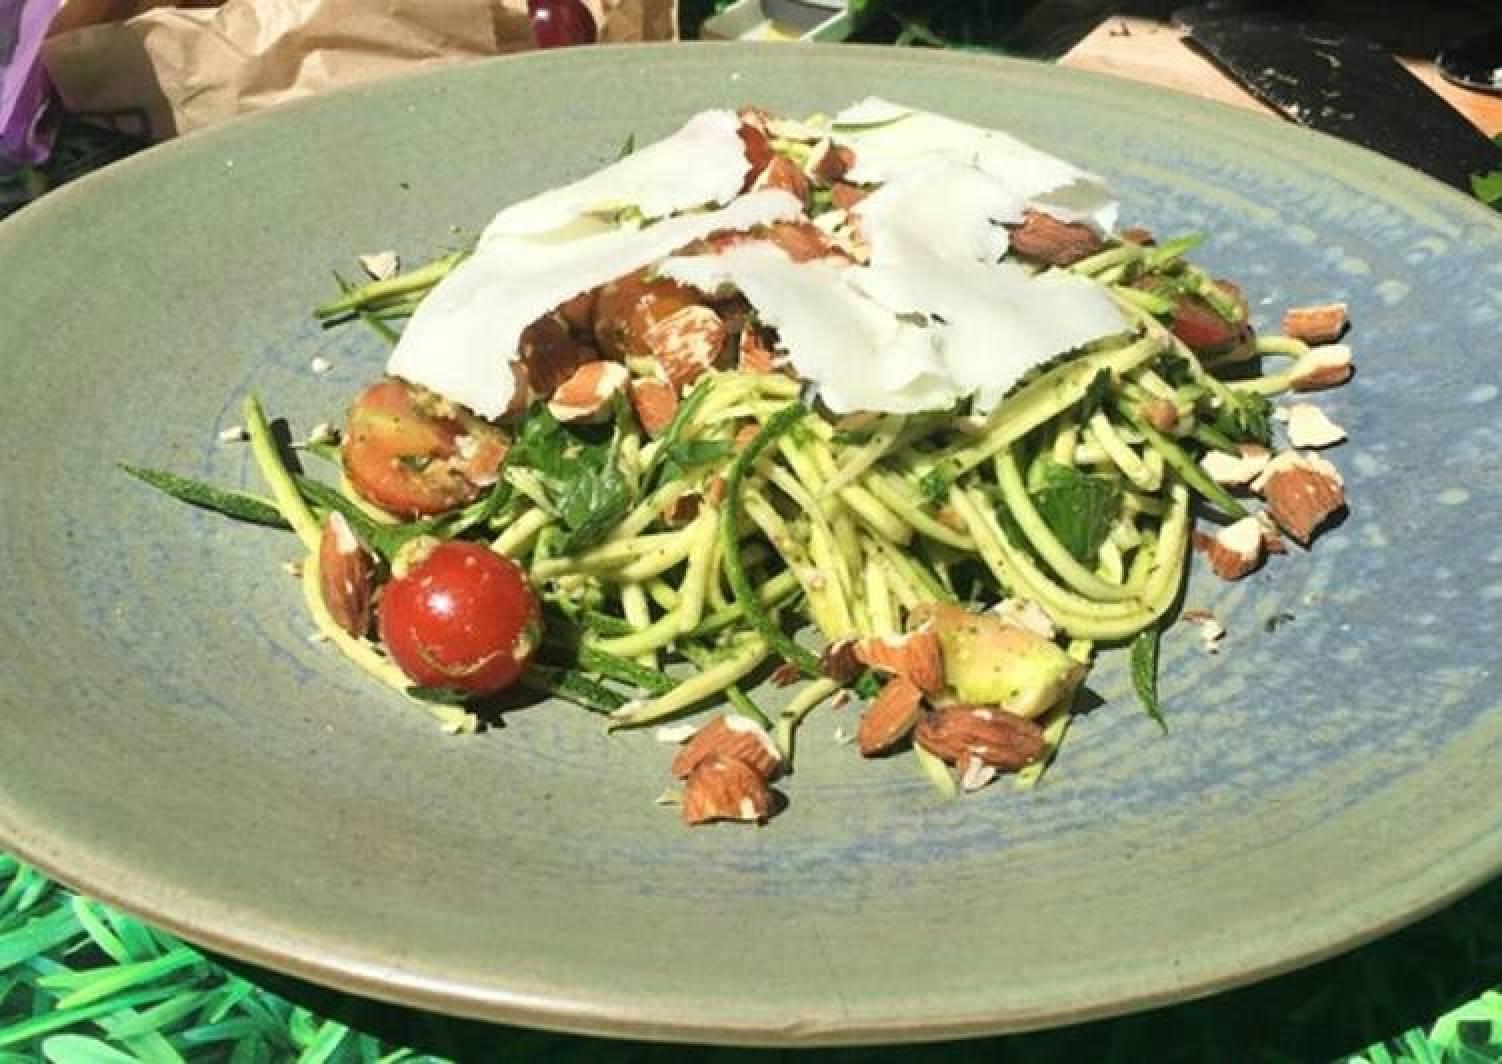 Pesto courgetti salad with feta and almonds